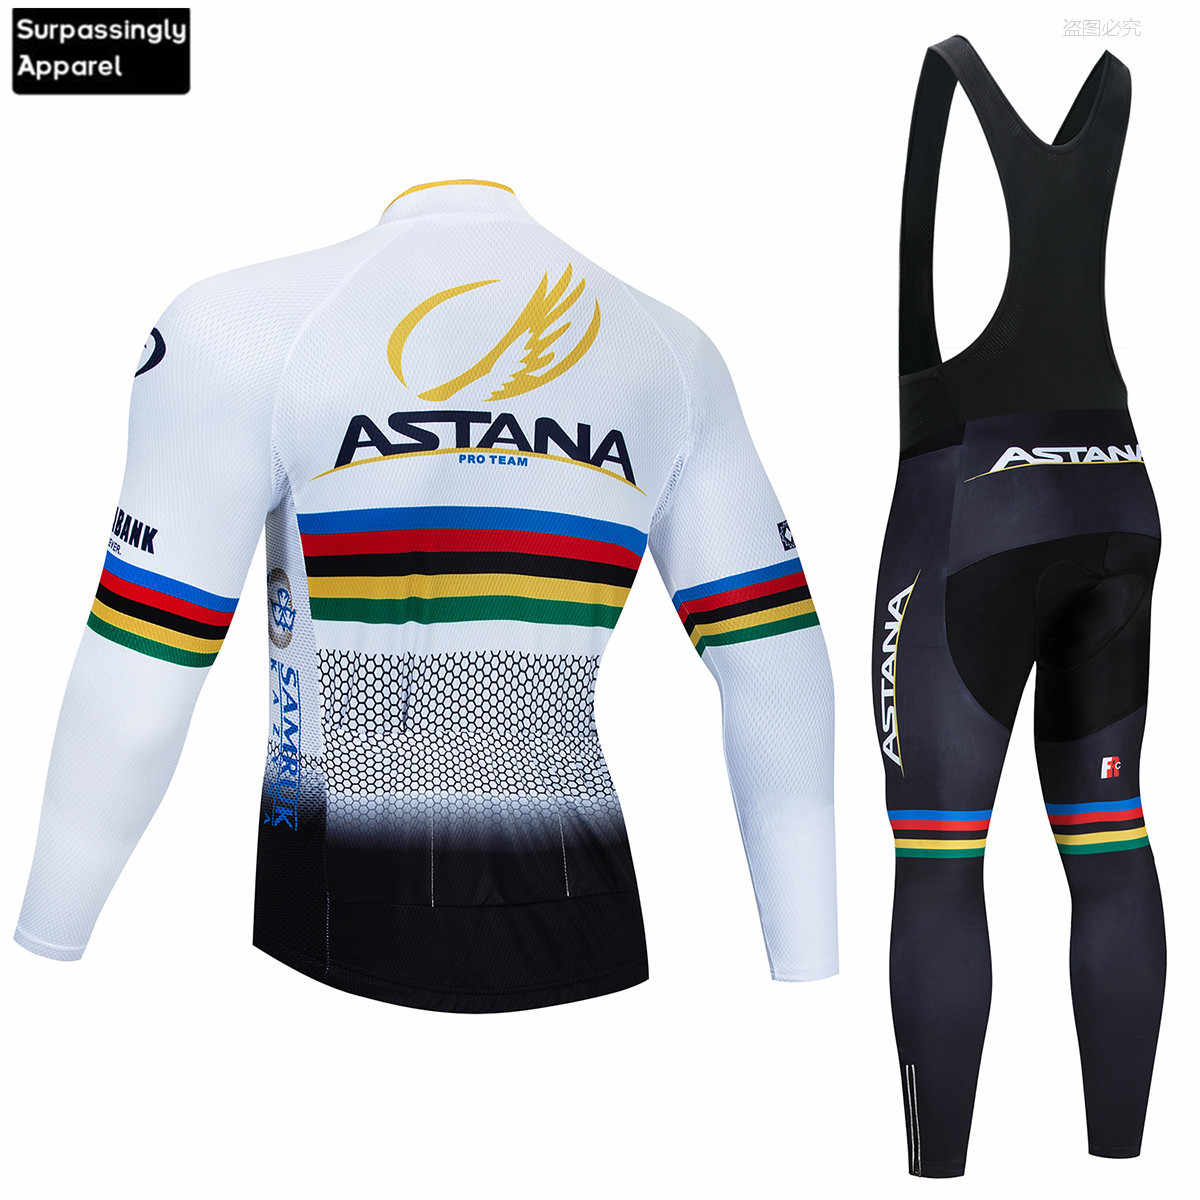 2019 ASTANA Jersey de Ciclismo para Hombre conjunto de manga larga MTB Ropa de bicicleta Maillot Ropa de Ciclismo Hombre Ropa de bicicleta 9D GEL pantalones de babero